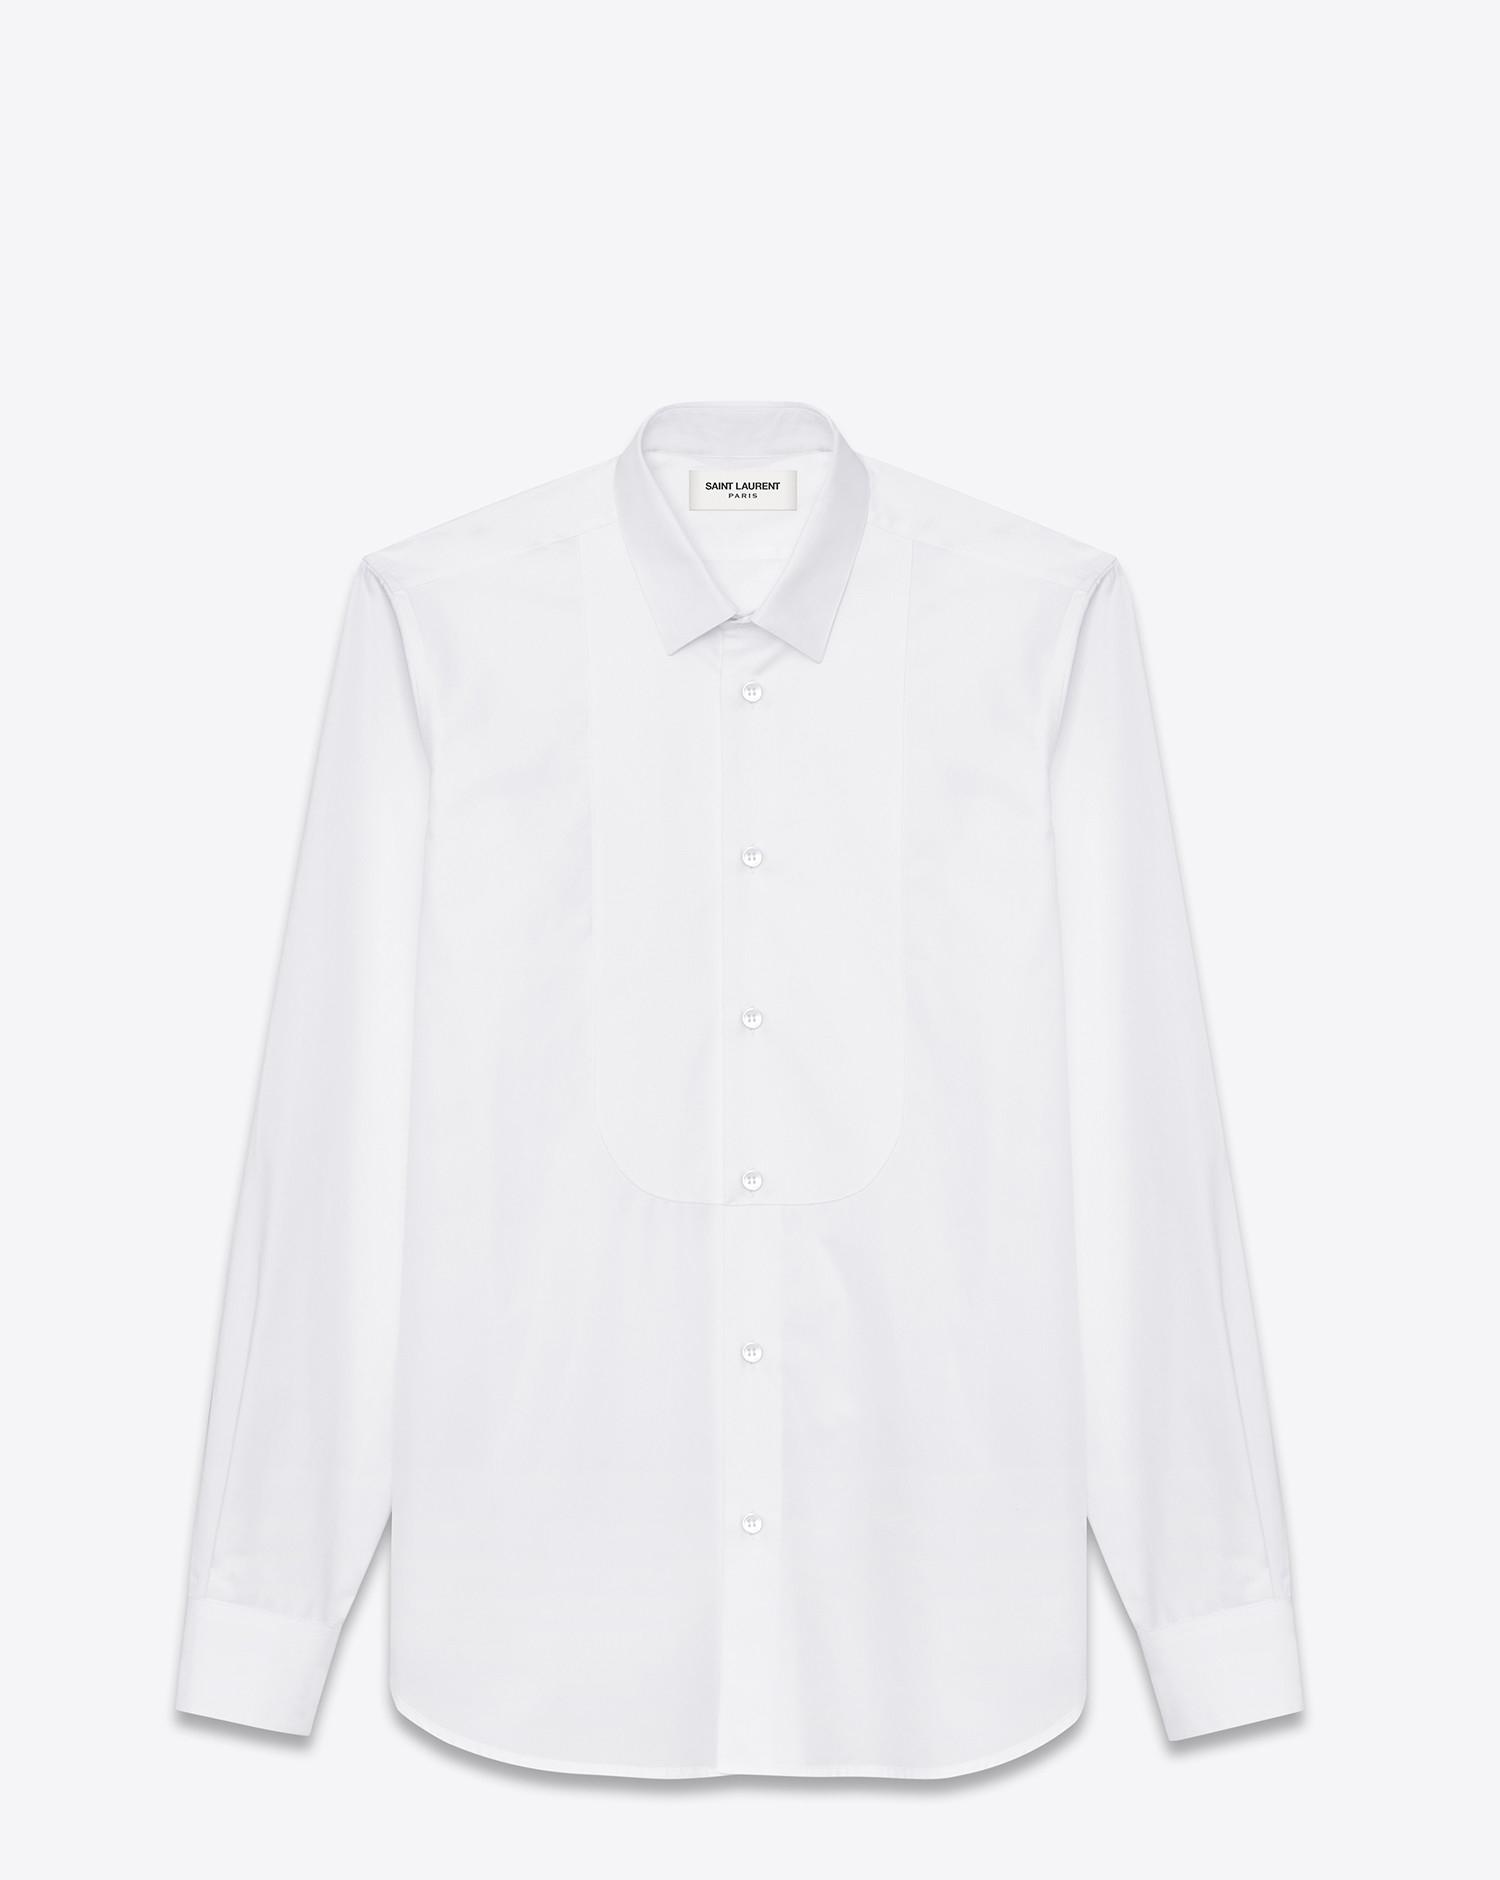 Saint laurent pique plastron yves collar shirt in white for Yves saint laurent white t shirt